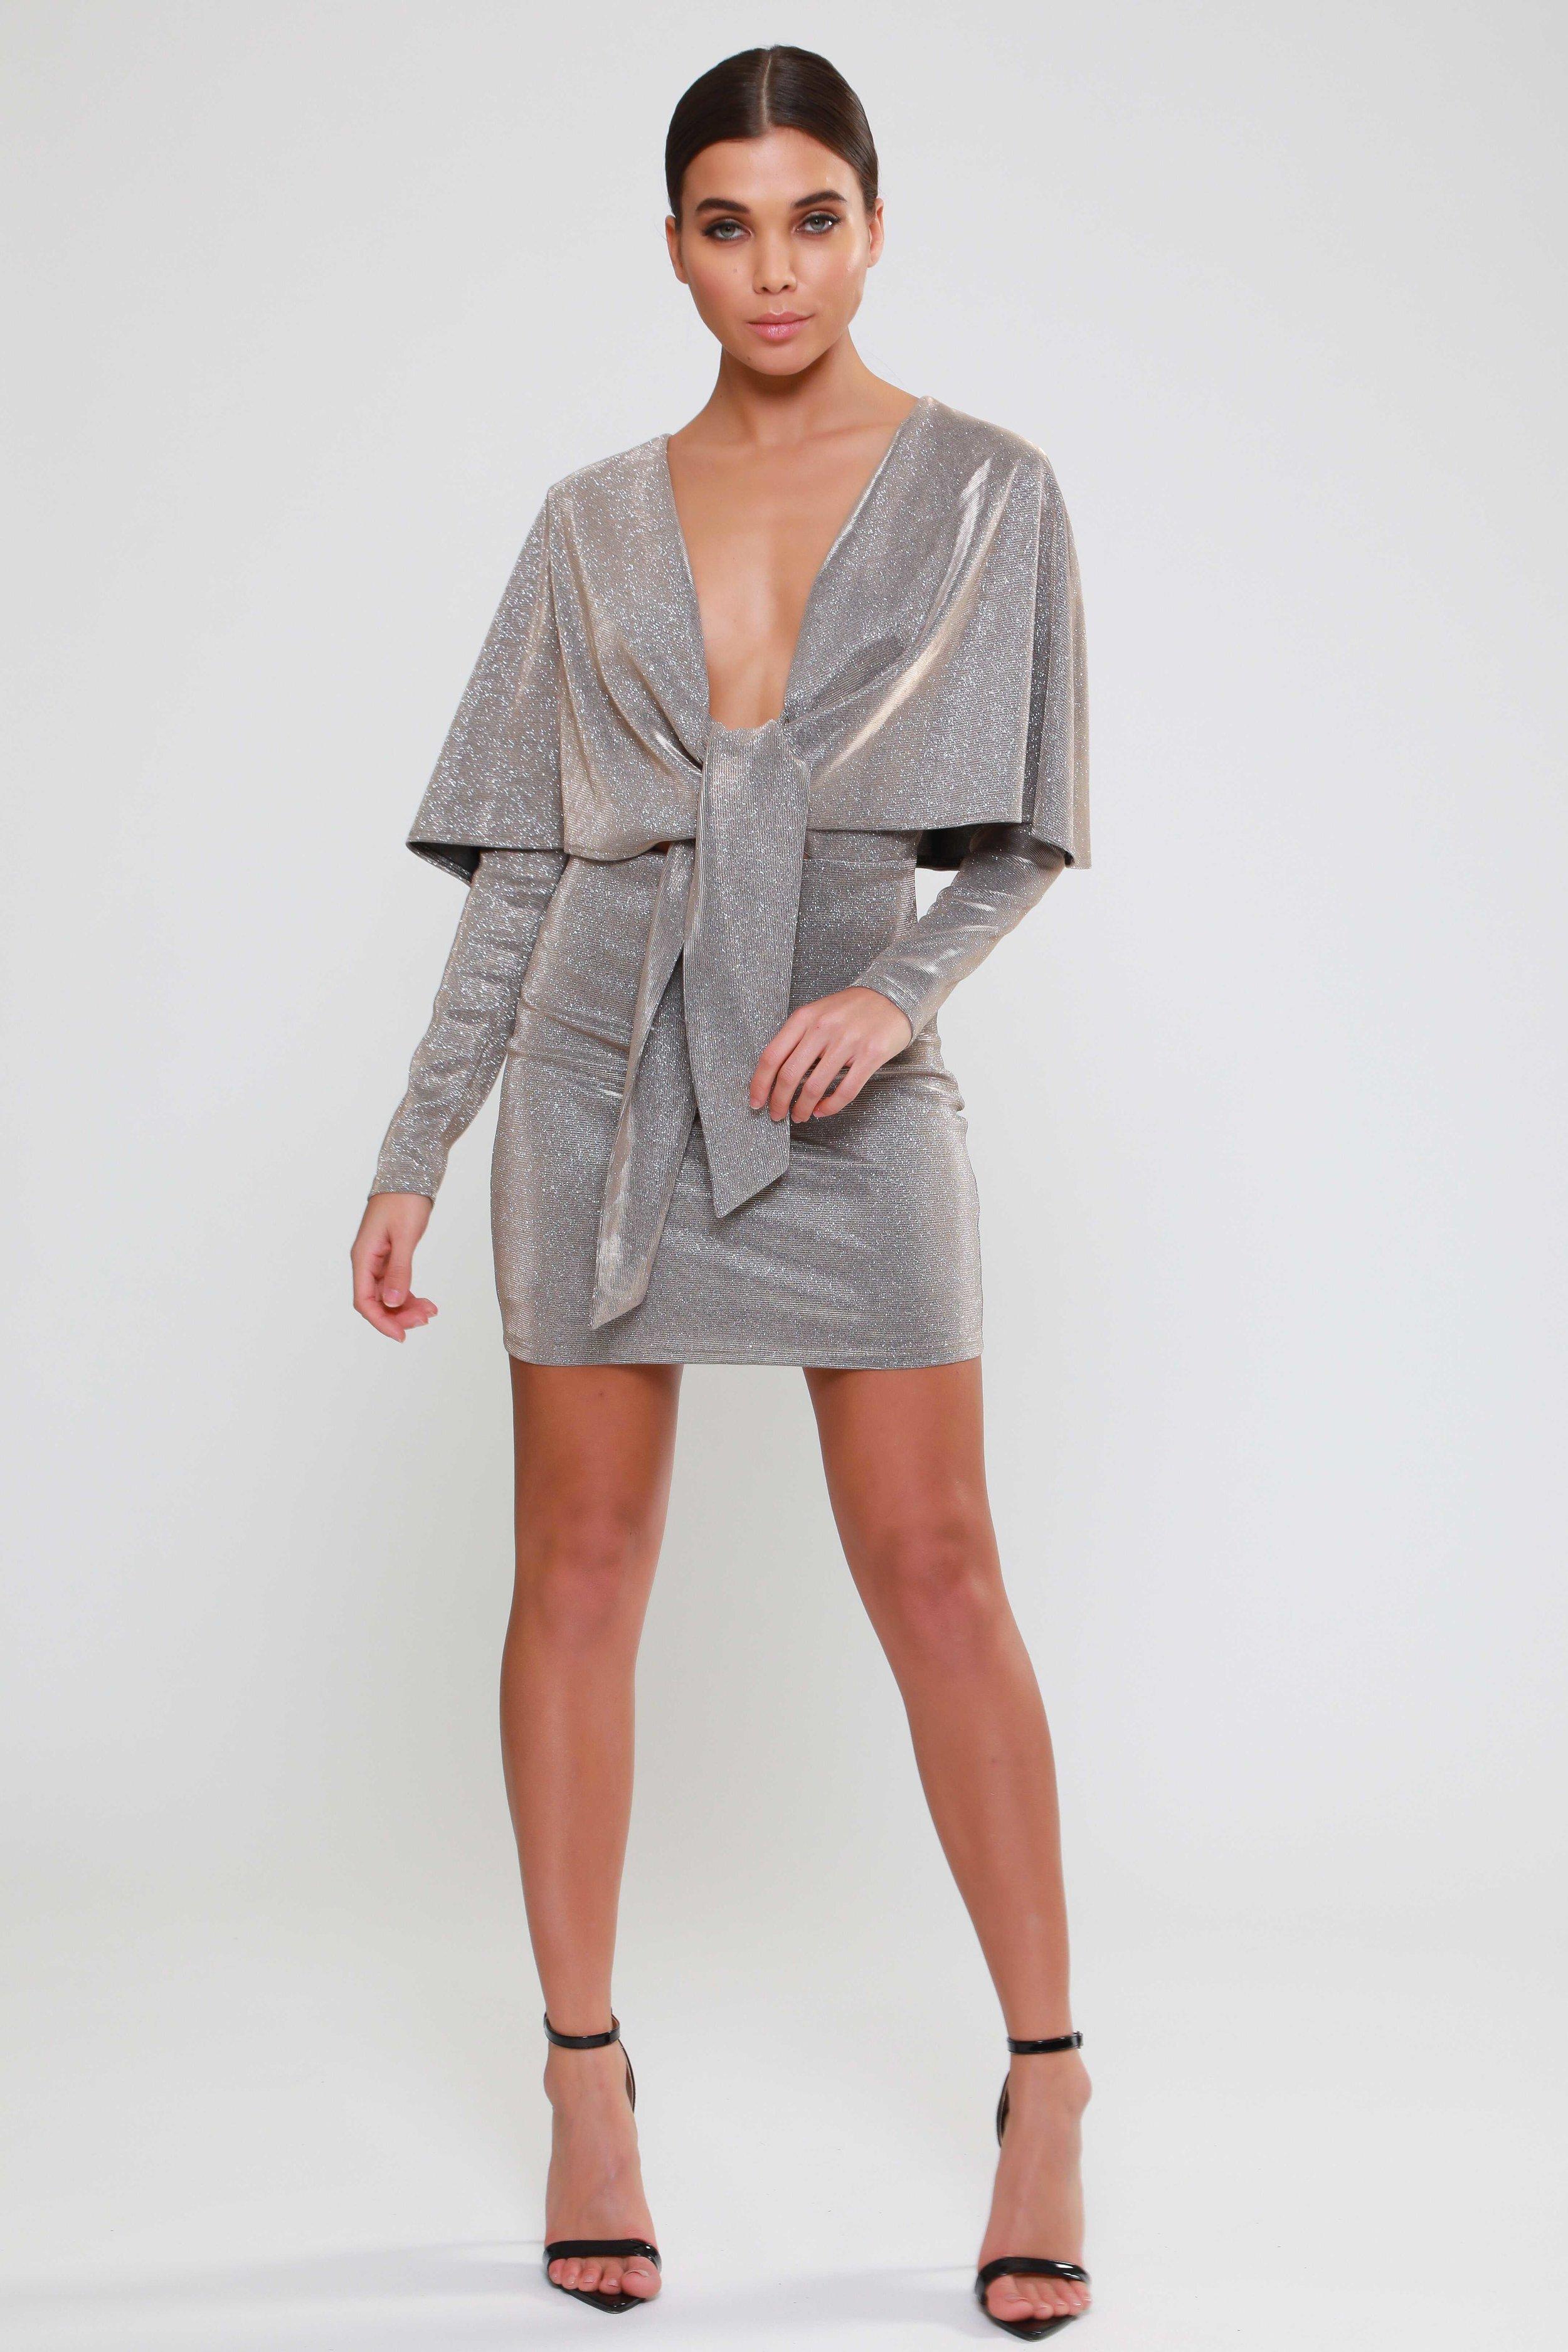 Tie Front Glitter  Cape Dress   £53.00